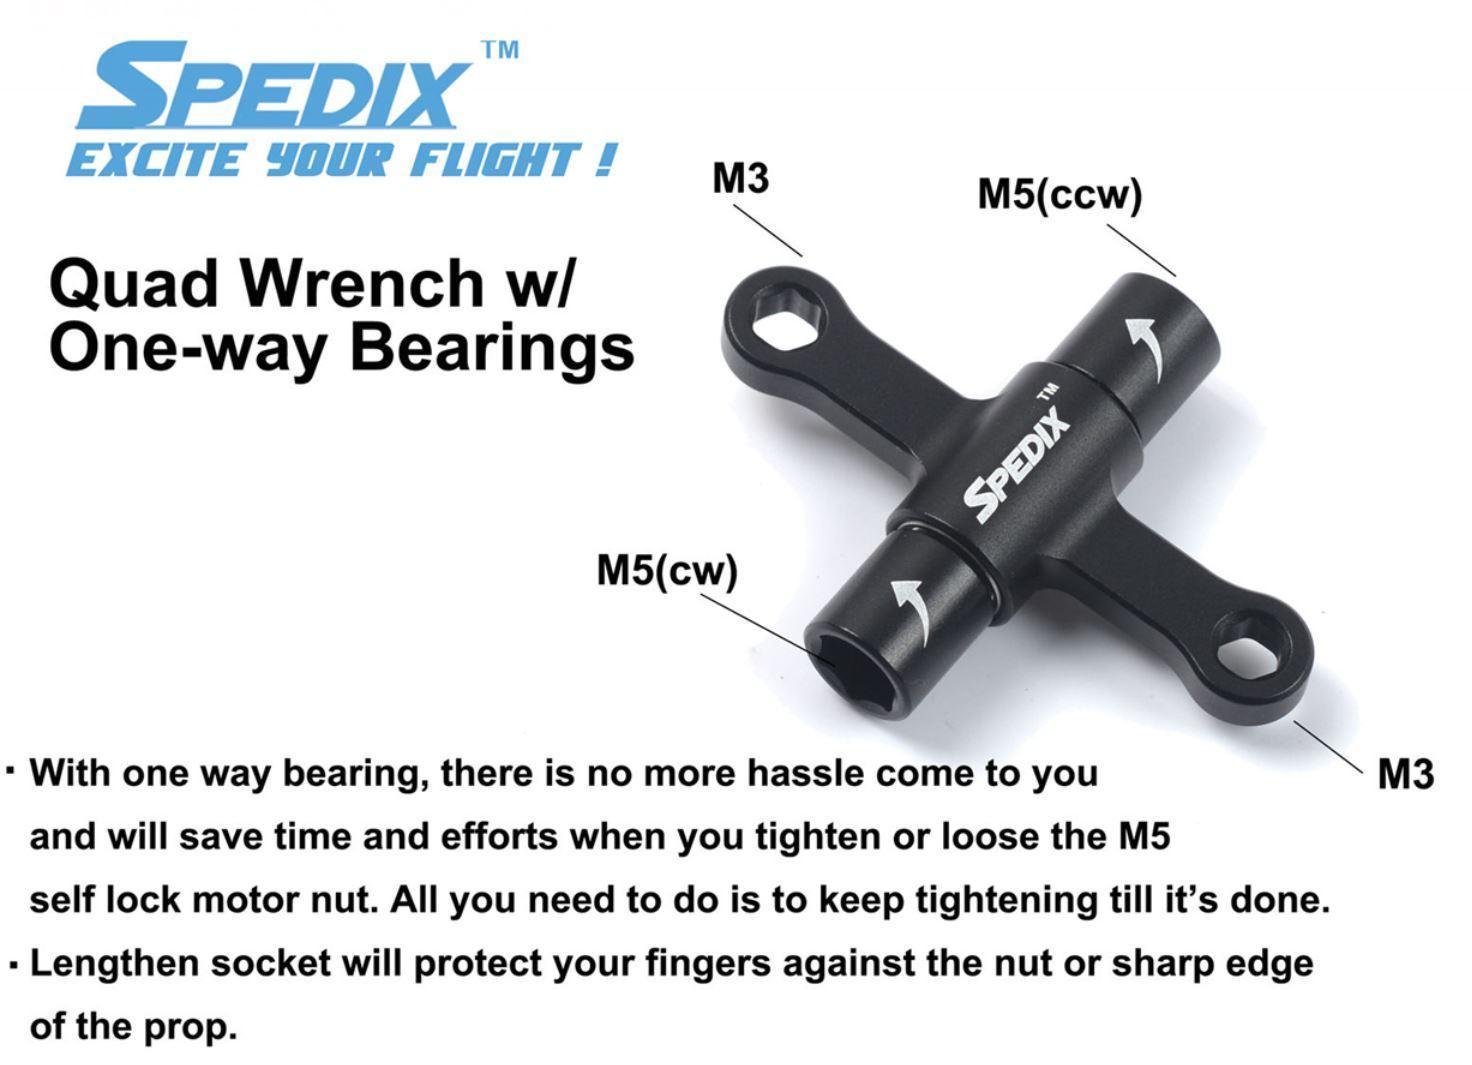 spedix-quad-wrench-tool.jpg